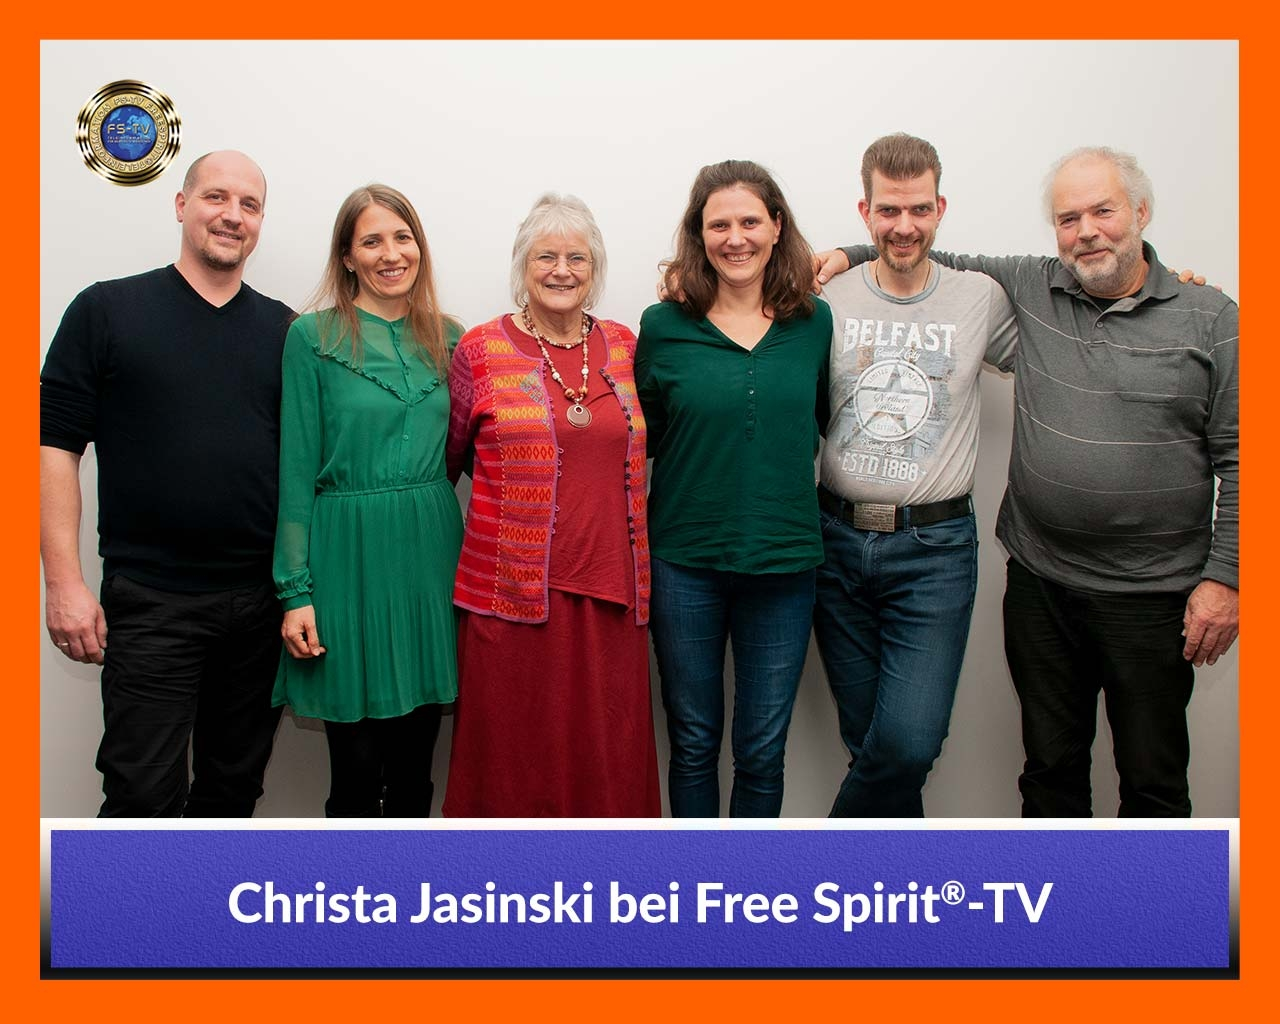 Galleriebild-Christa-Jasinski-08